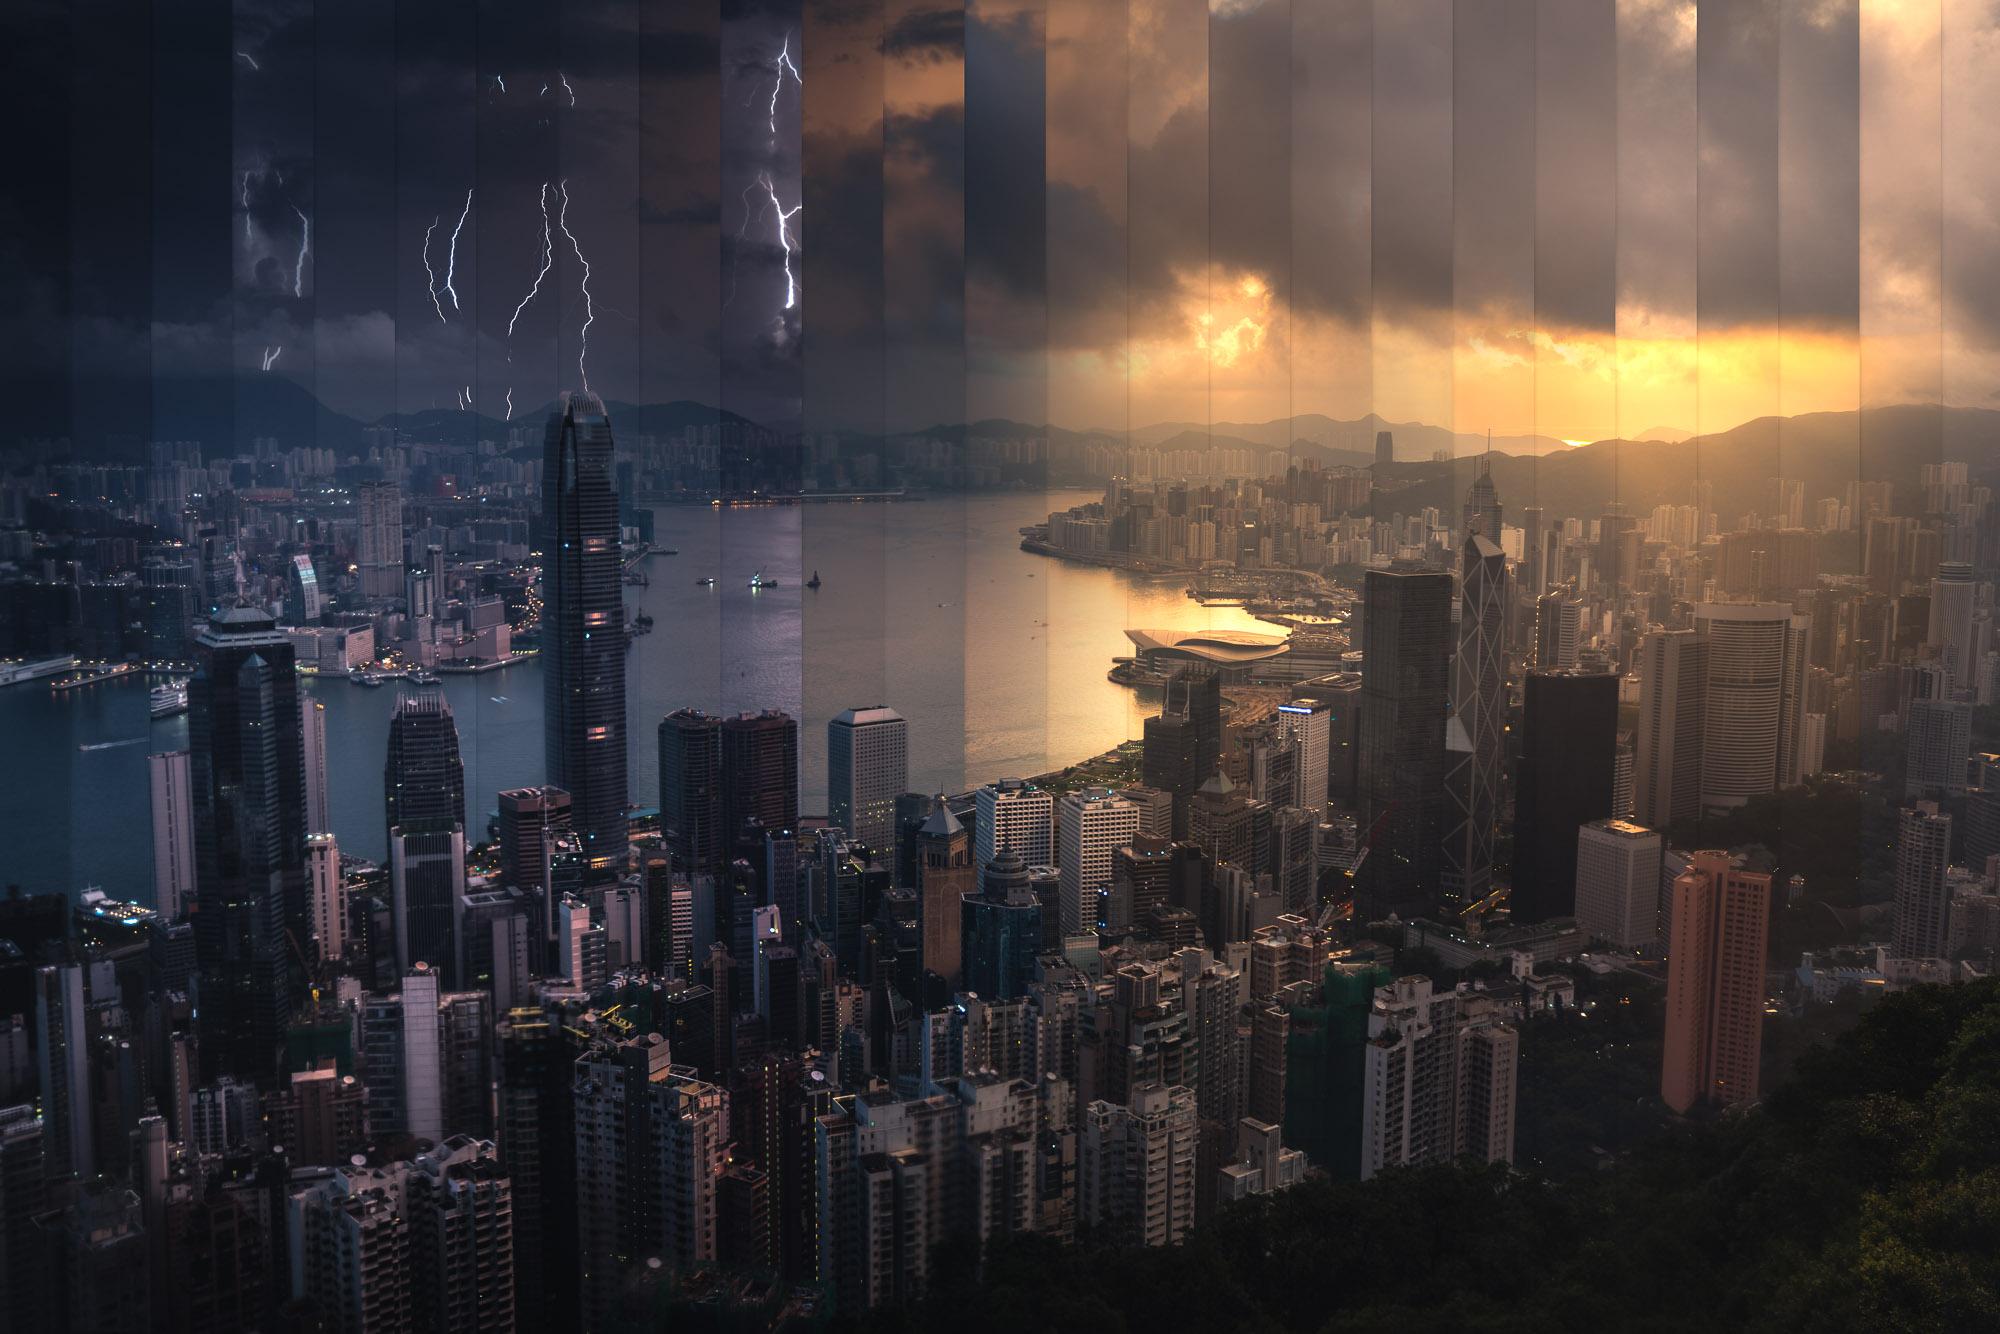 Timeslice Hong Kong in 25 photos